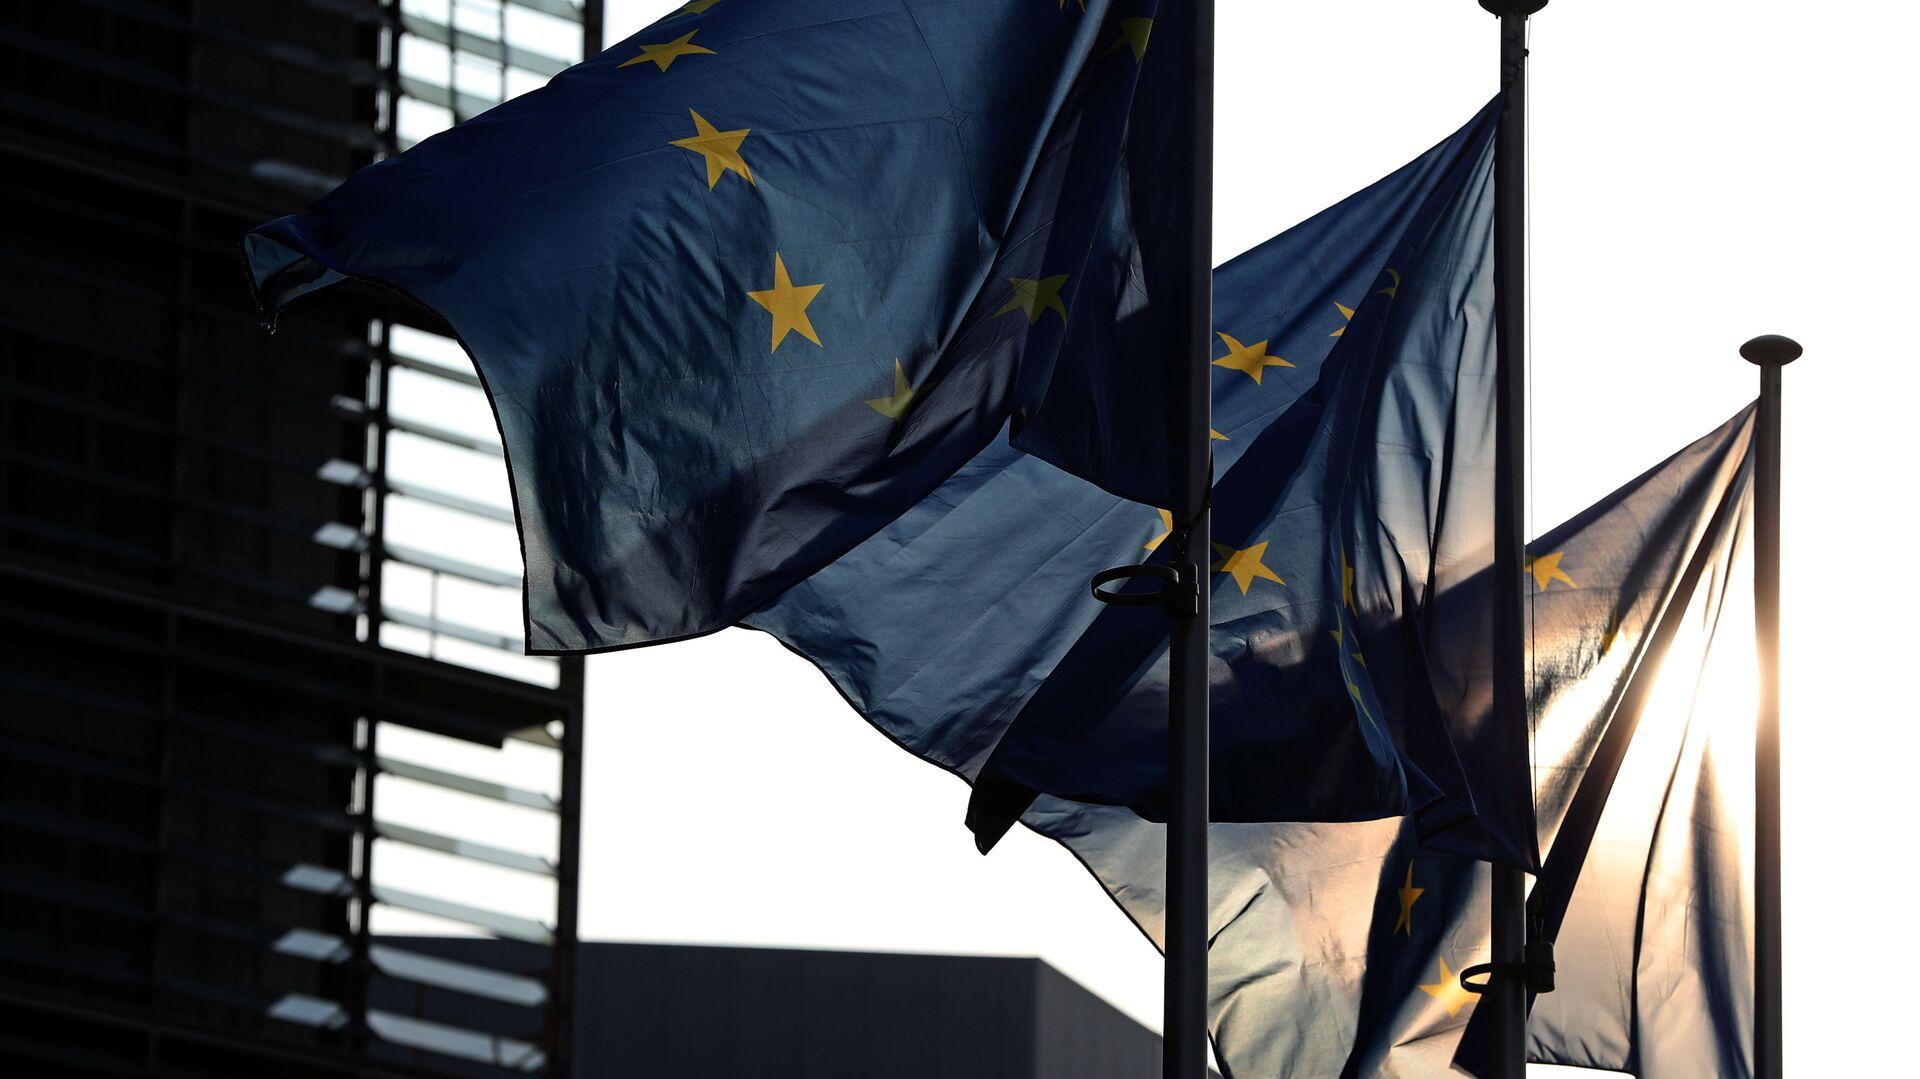 Vlajky EU v Bruselu - Sputnik Česká republika, 1920, 12.05.2021